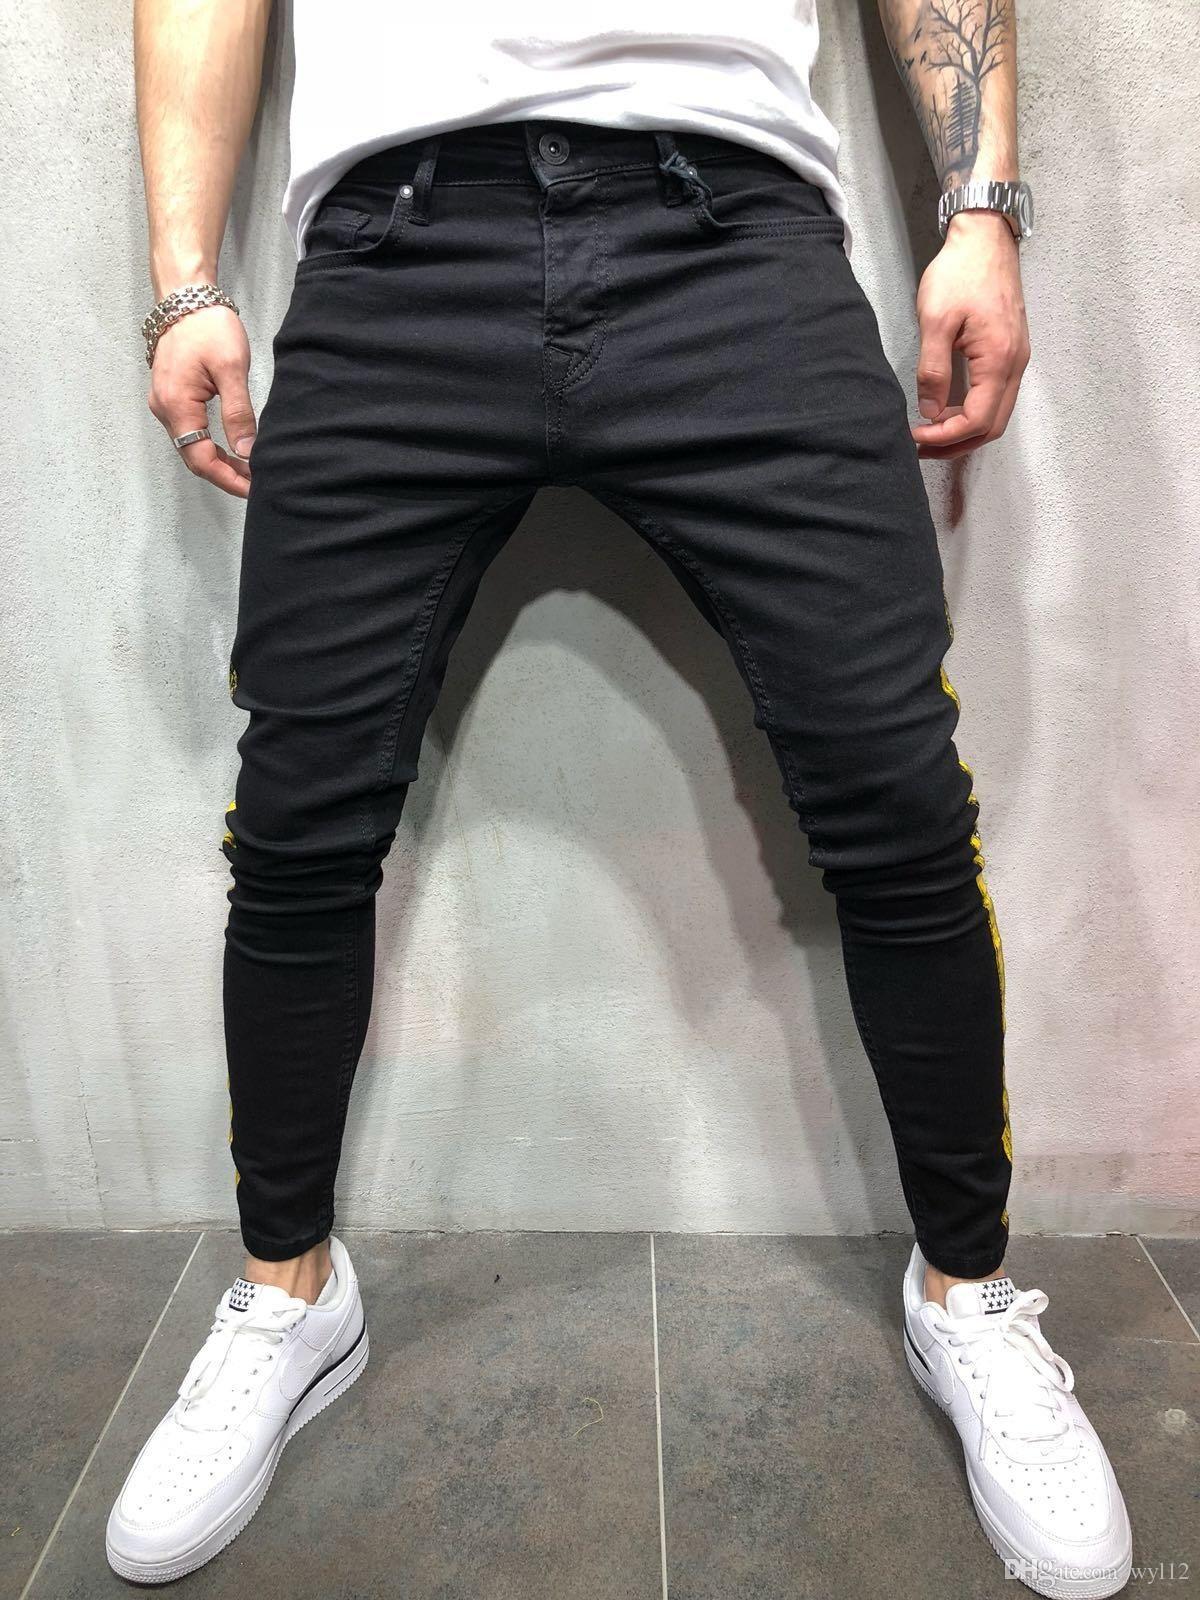 2019 Mens Designer Pants New Style Casual Skinny Sweatpants Mens Designer Jeans Drop Crotch Jogging Pants Mens Jeans